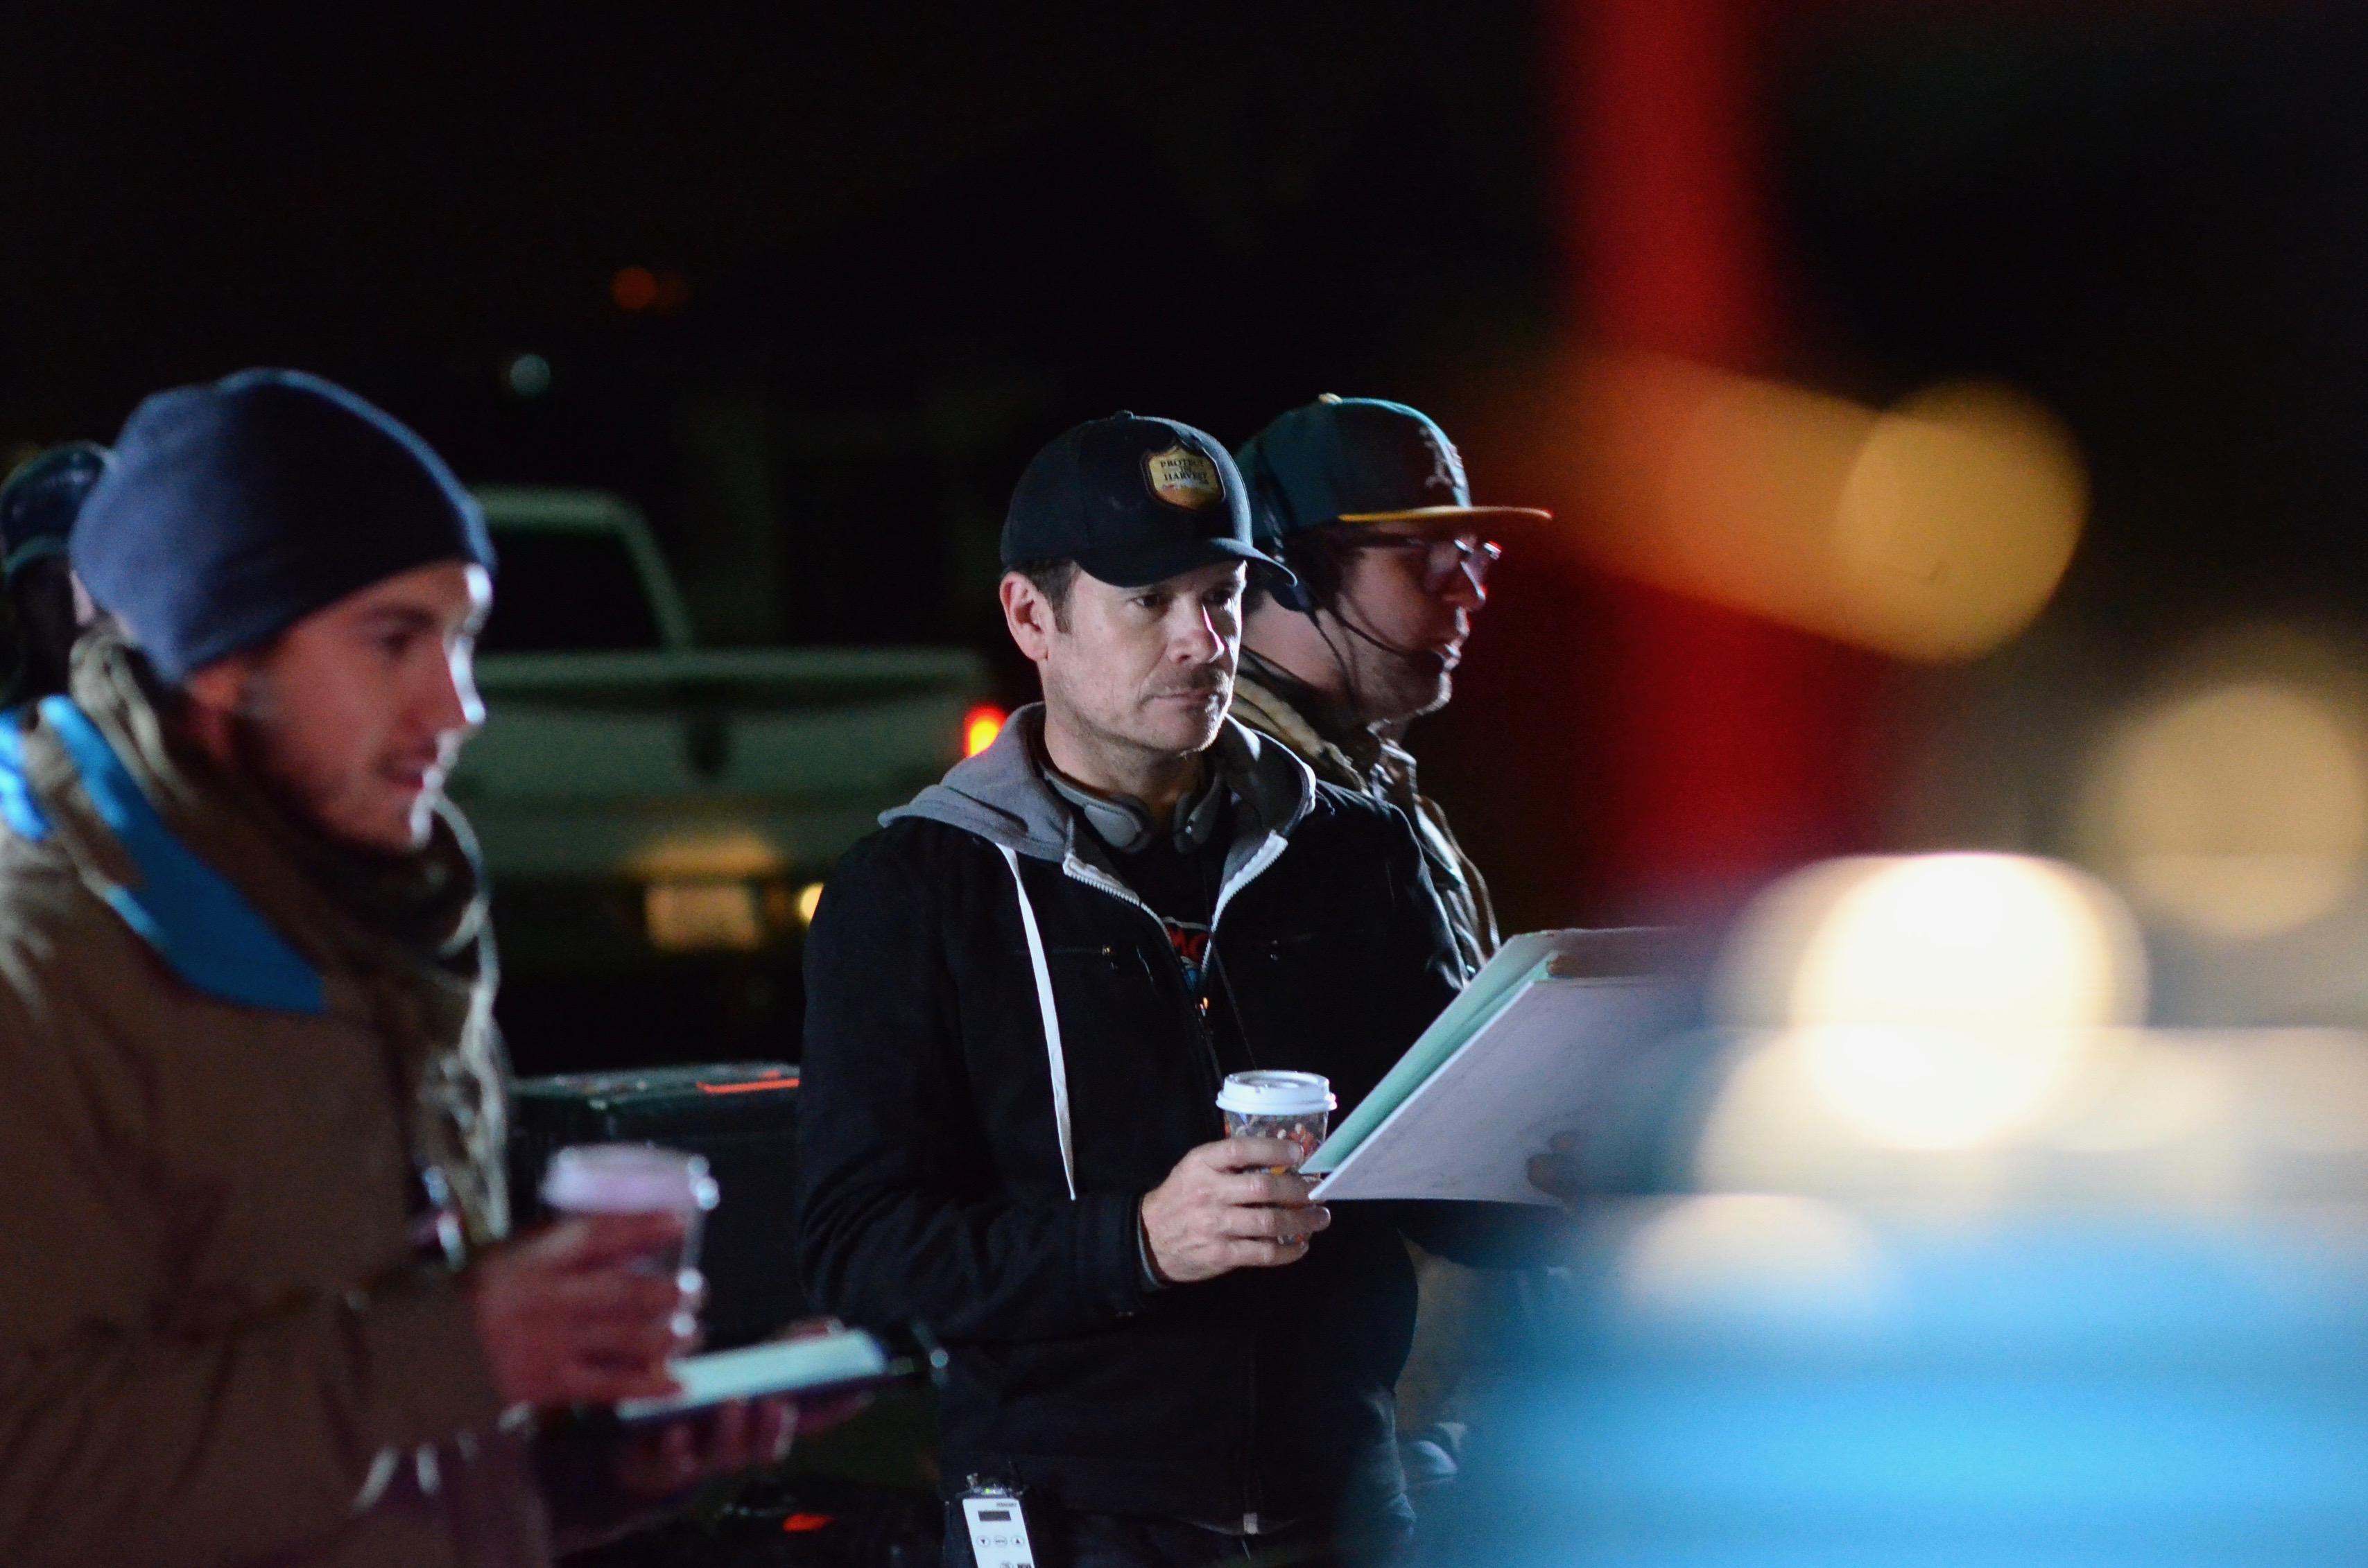 Director Alex Ranarivelo on the set of Dirt.